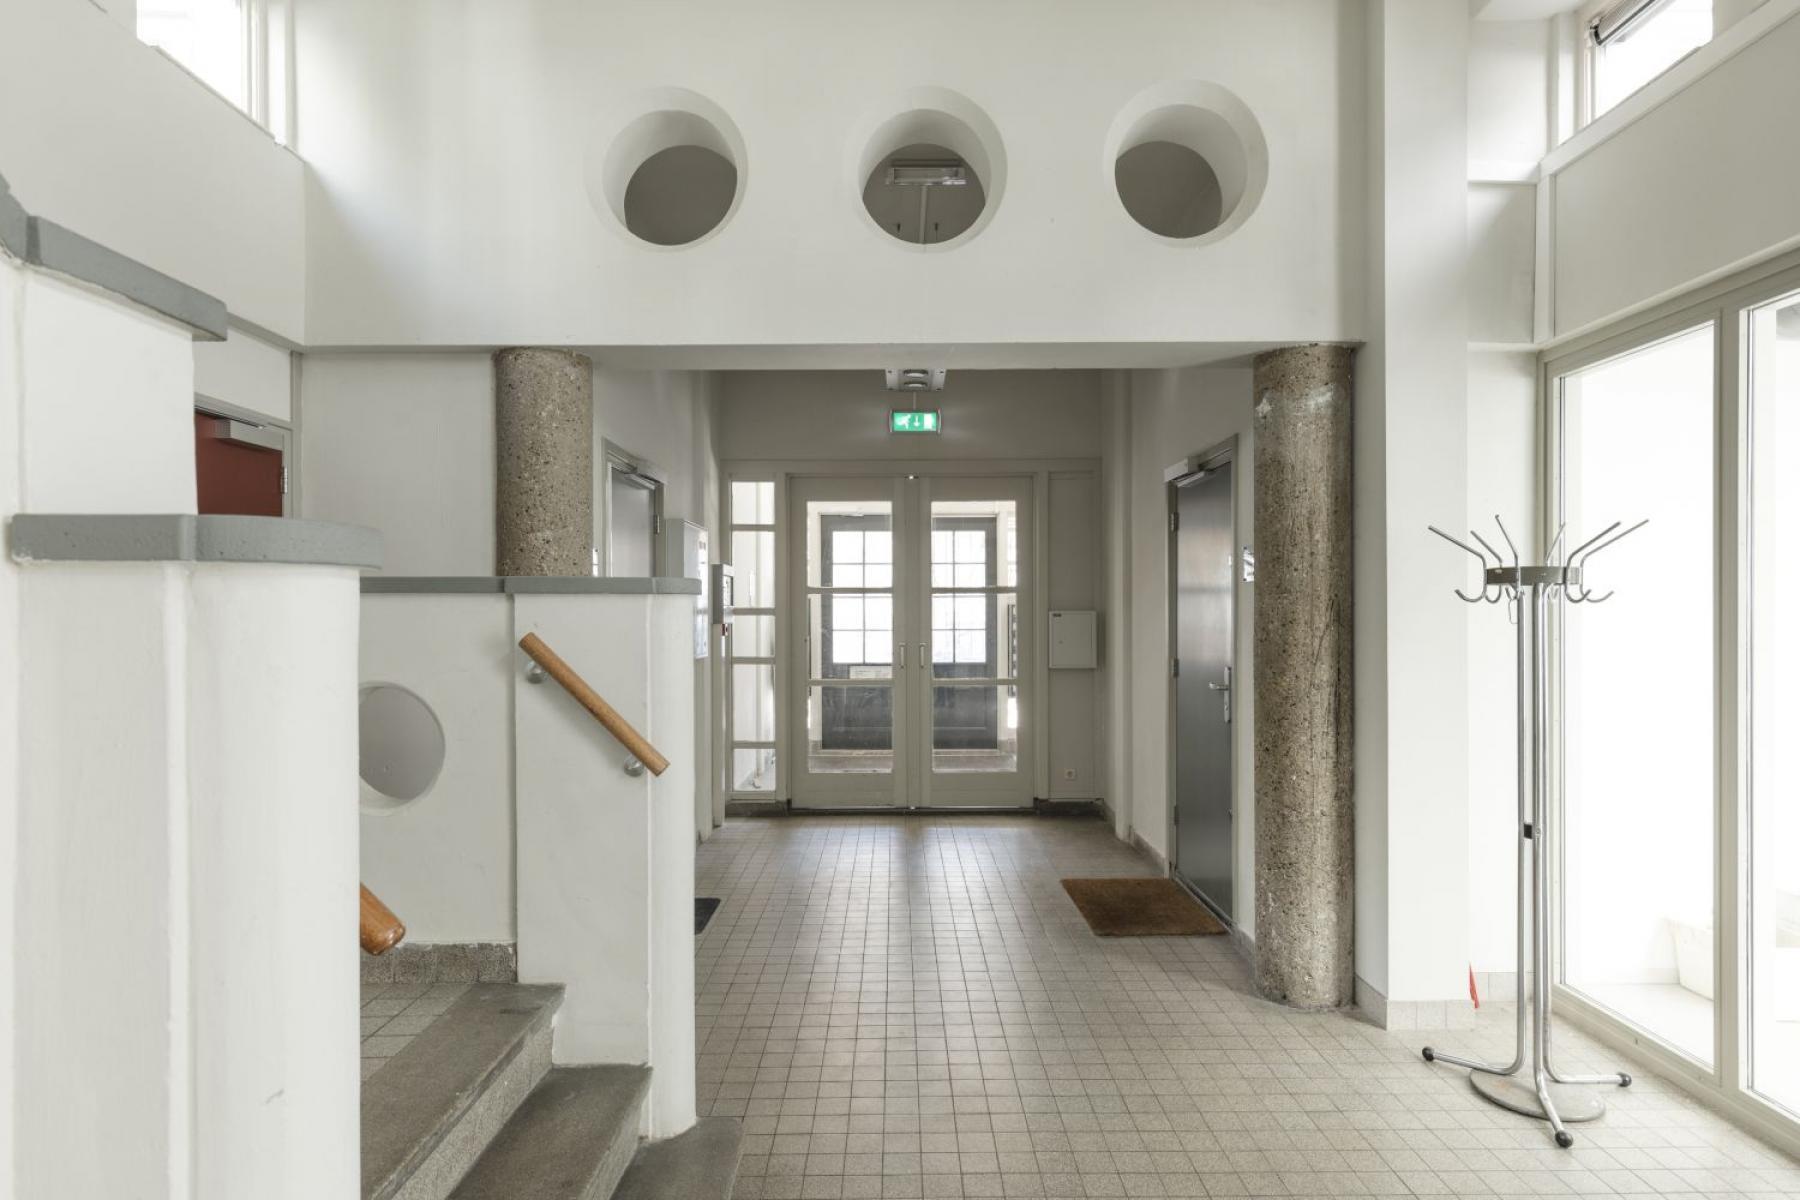 Rent office space Kraijenhoffstraat 137a, Amsterdam (8)